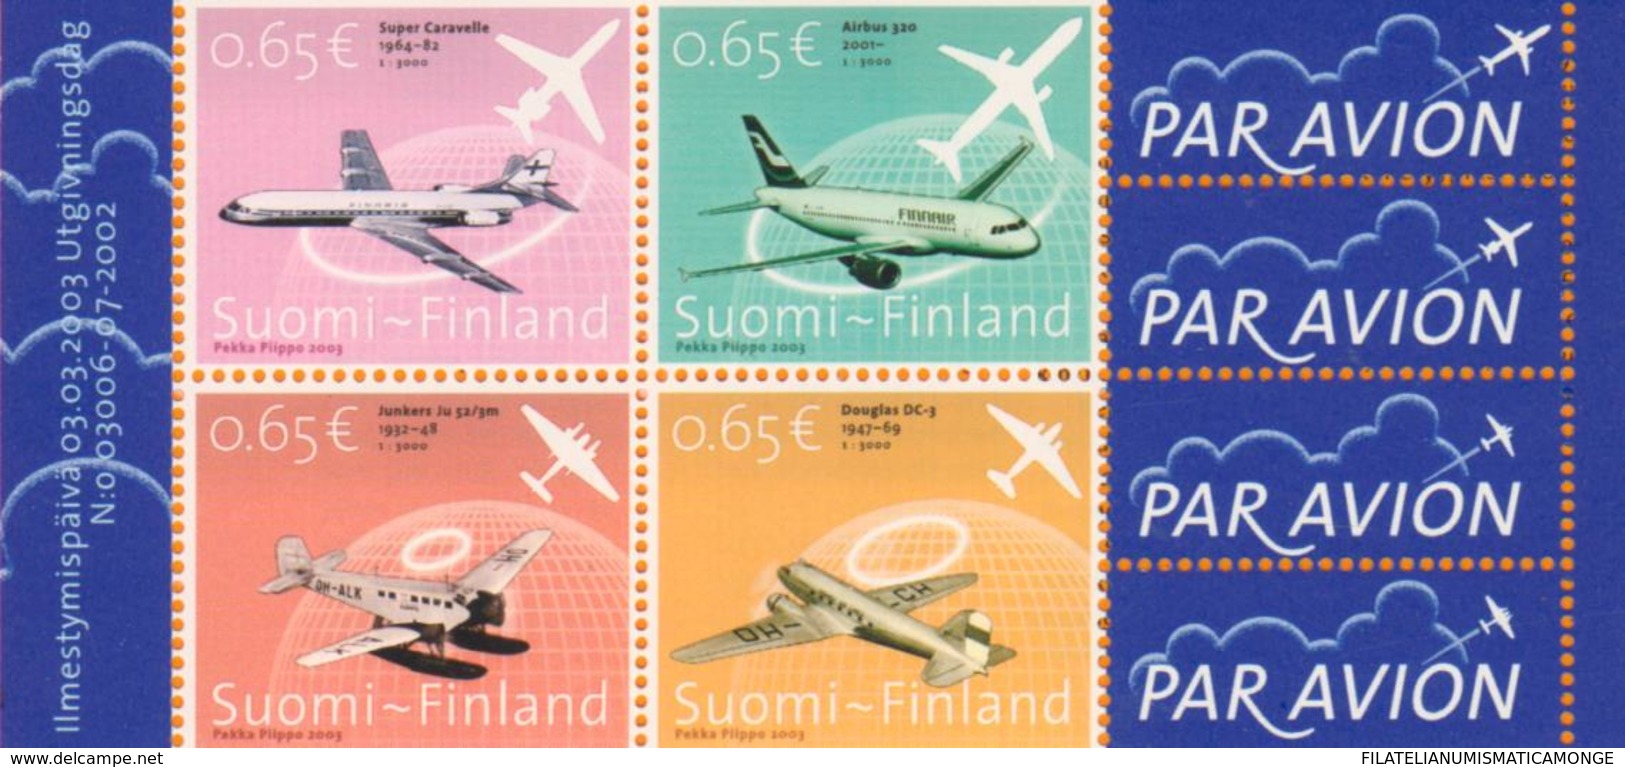 Finlandia 2003  Yvert Tellier  1607/10 Aviacion (4s) ** - Unused Stamps